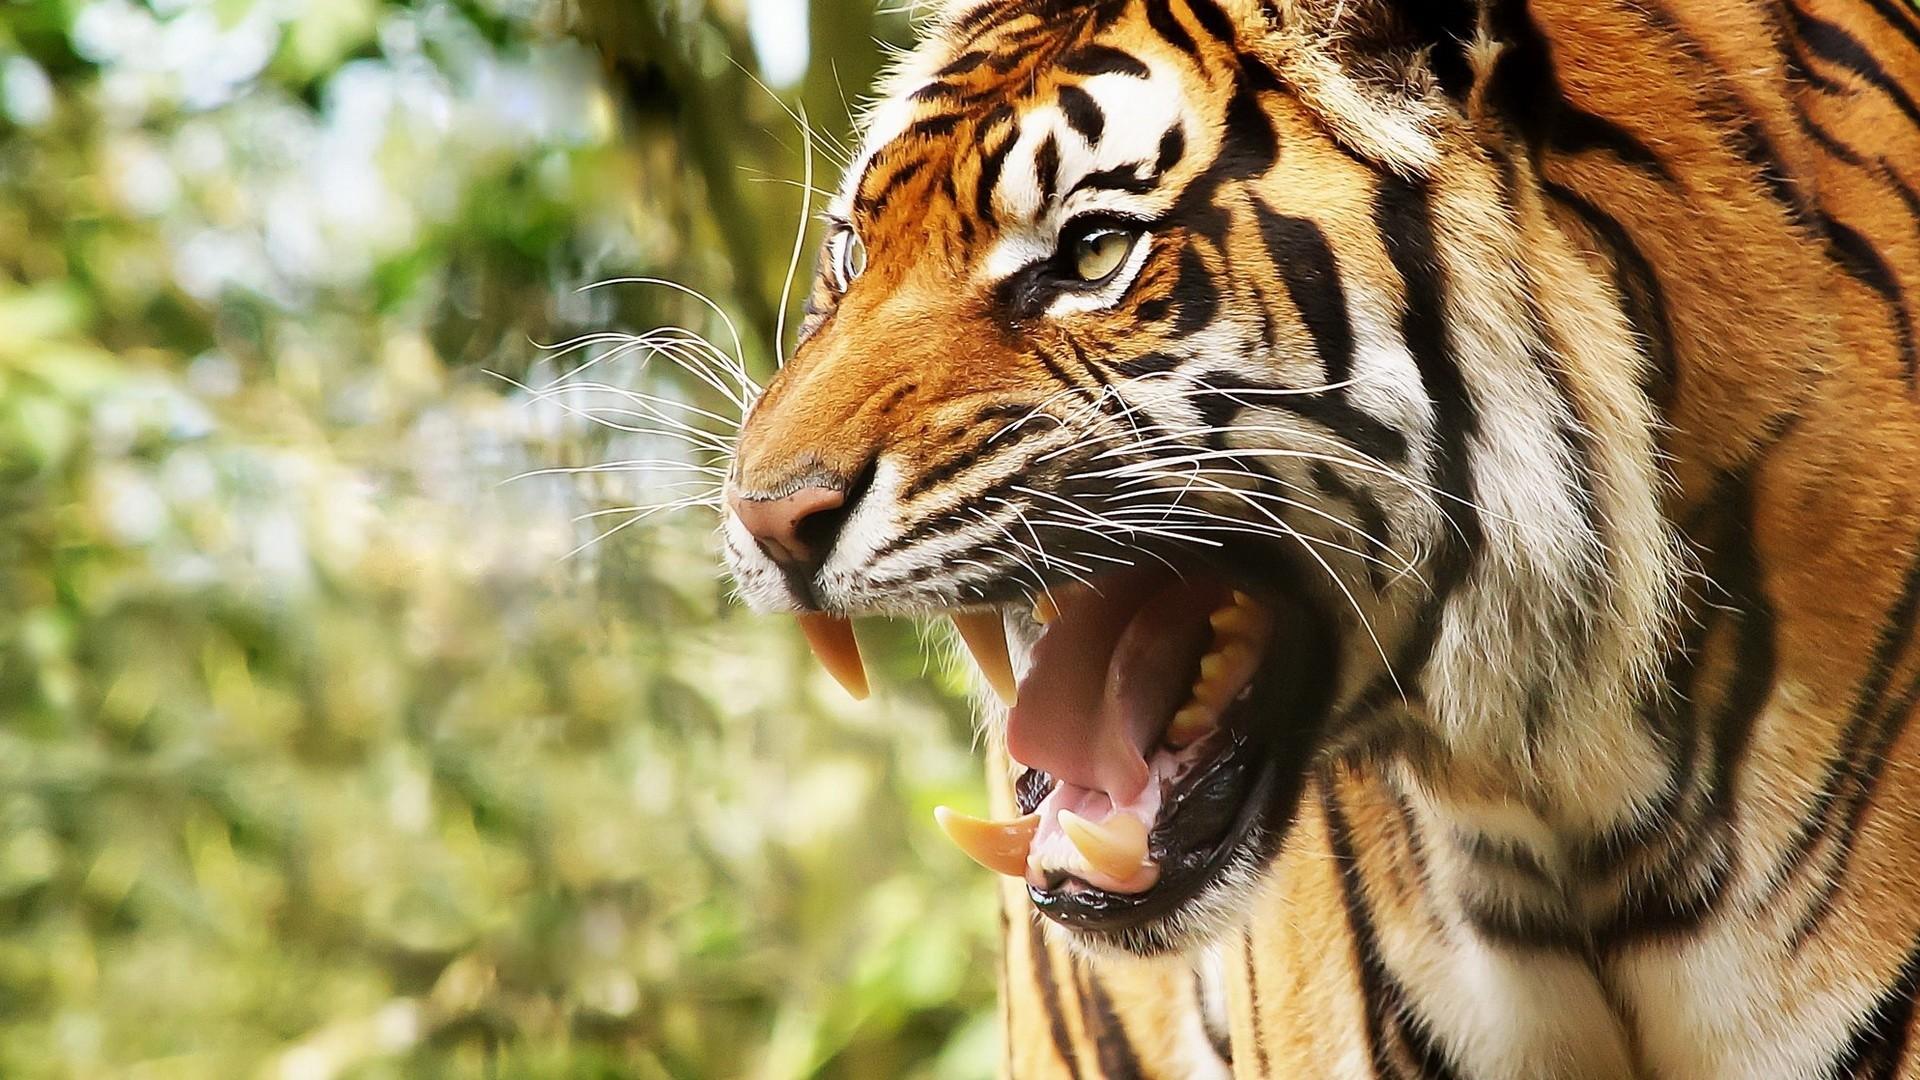 Preview wallpaper big cat, tiger, face, teeth, anger 1920×1080